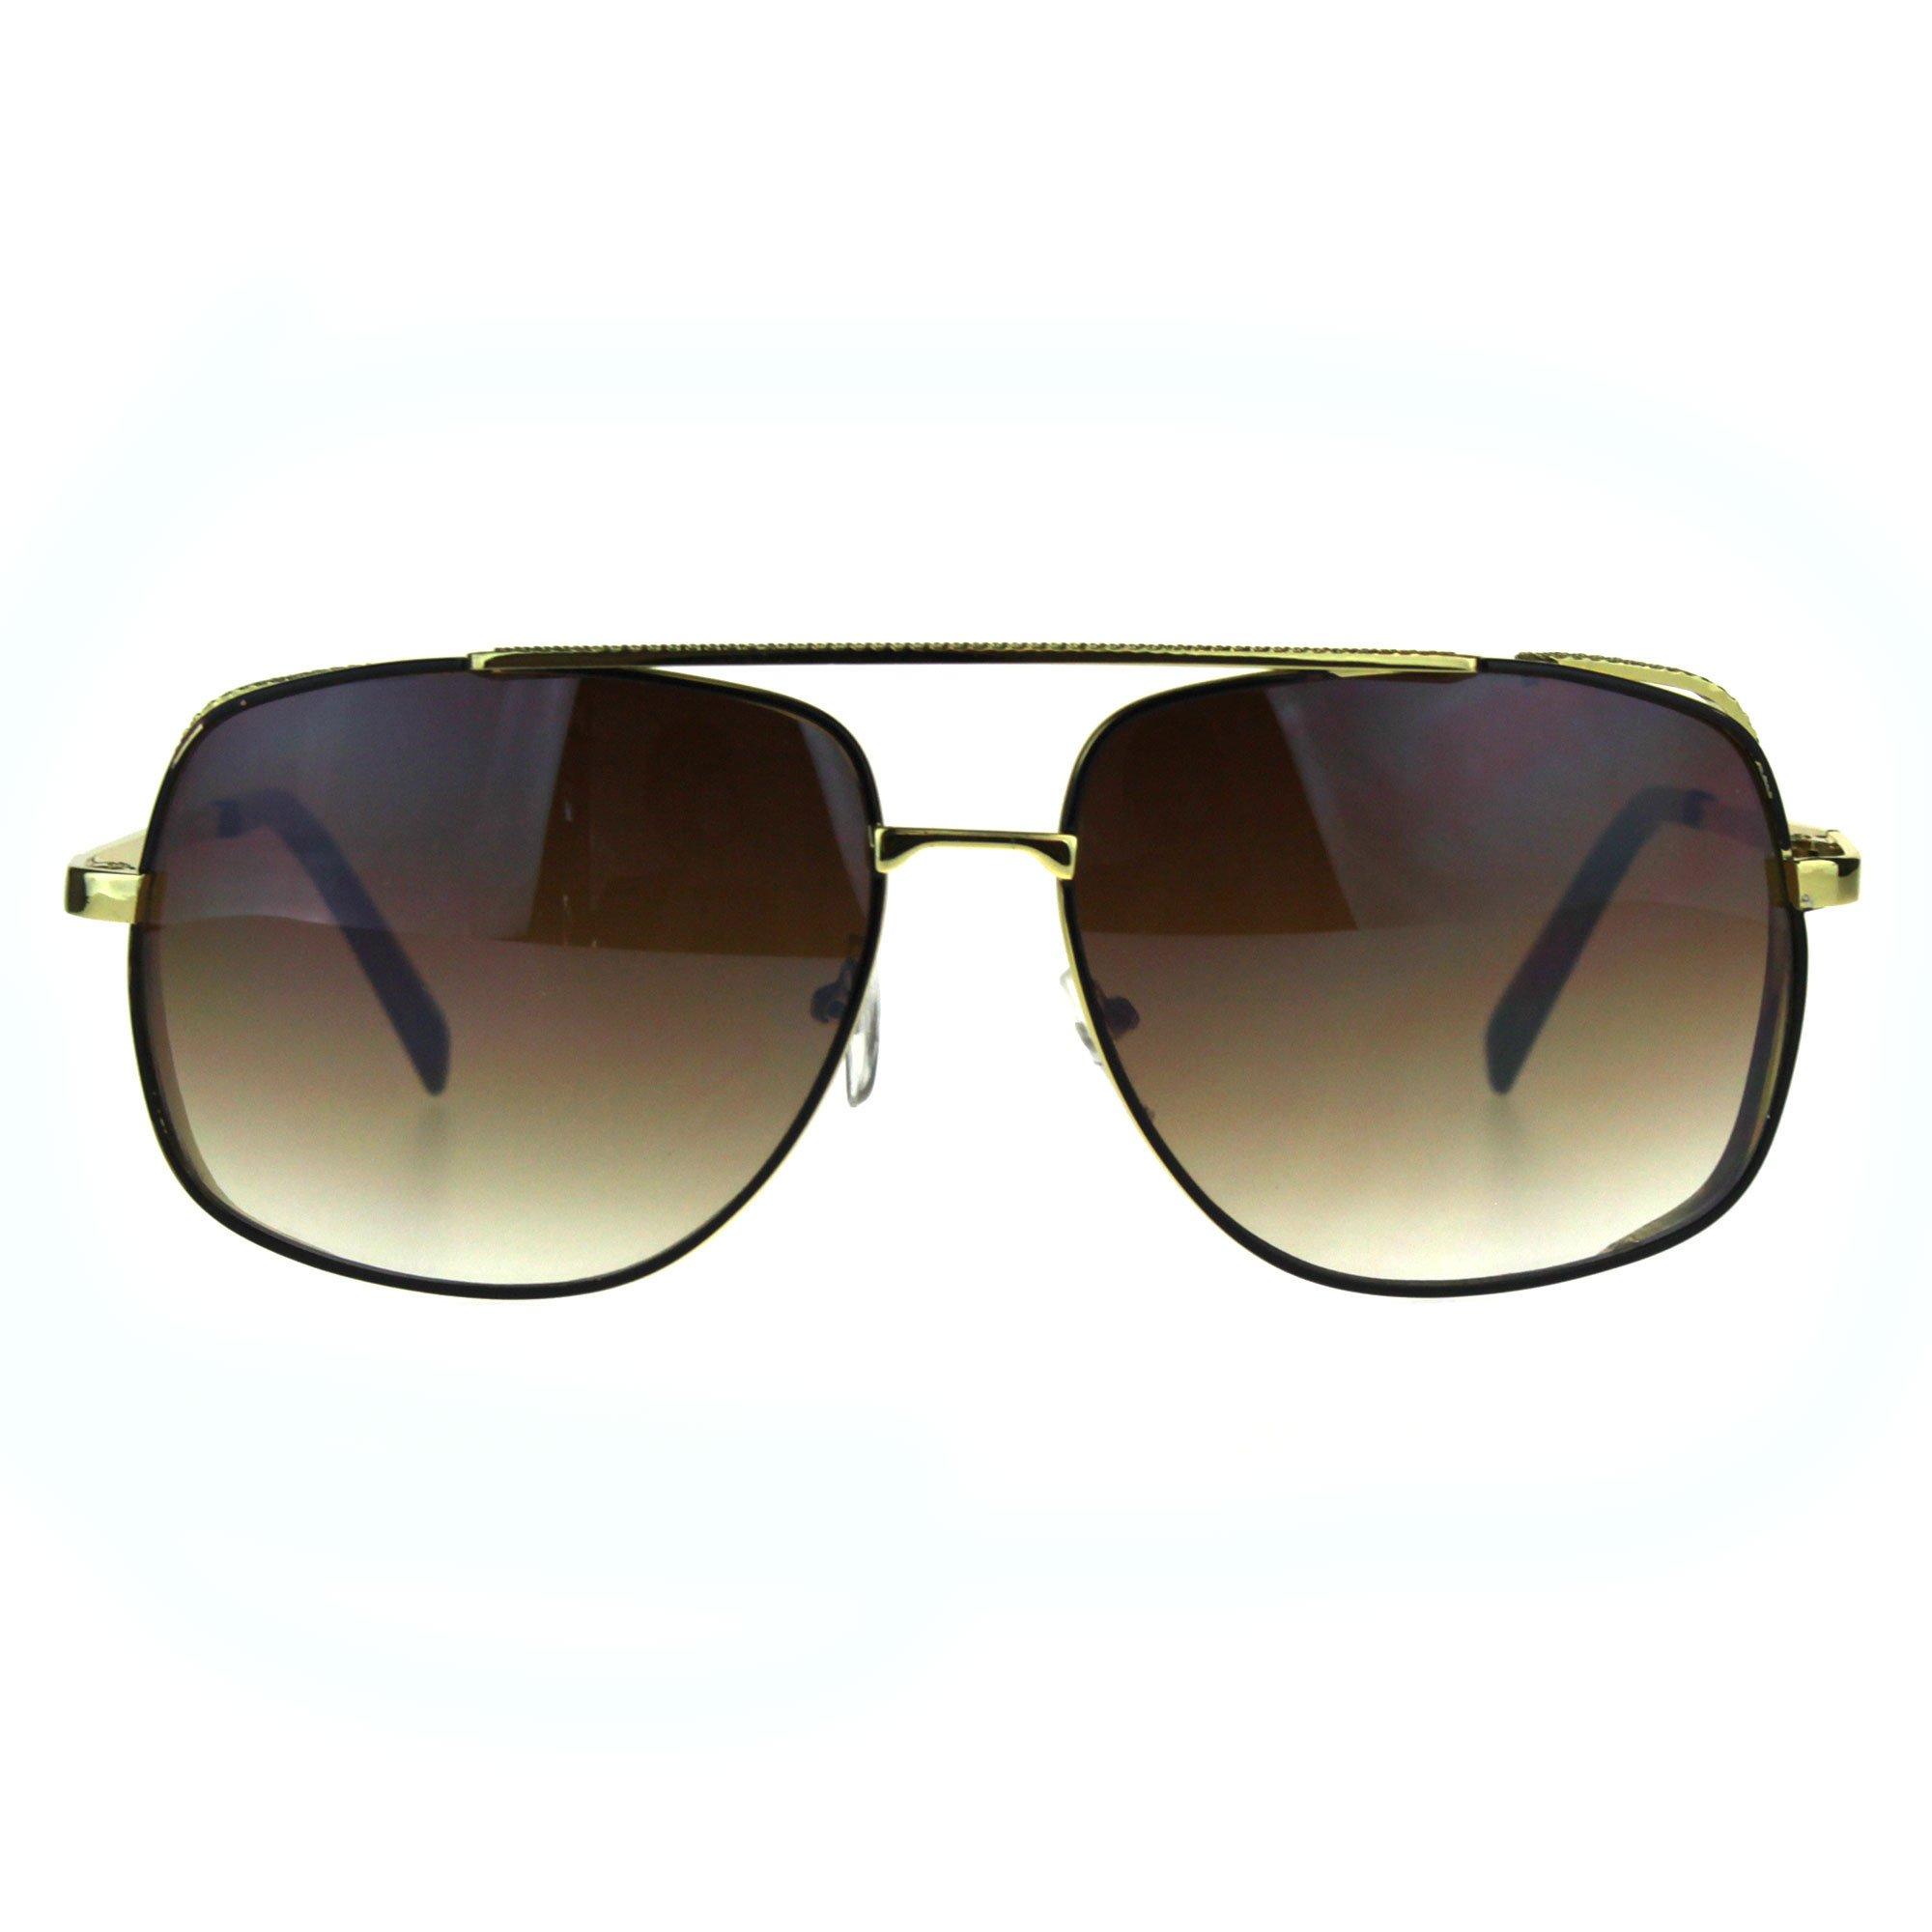 Mens Luxury Fashion Rectangular Racer Metal Rim Pilots Sunglasses Gold Brown Smoke by SA106